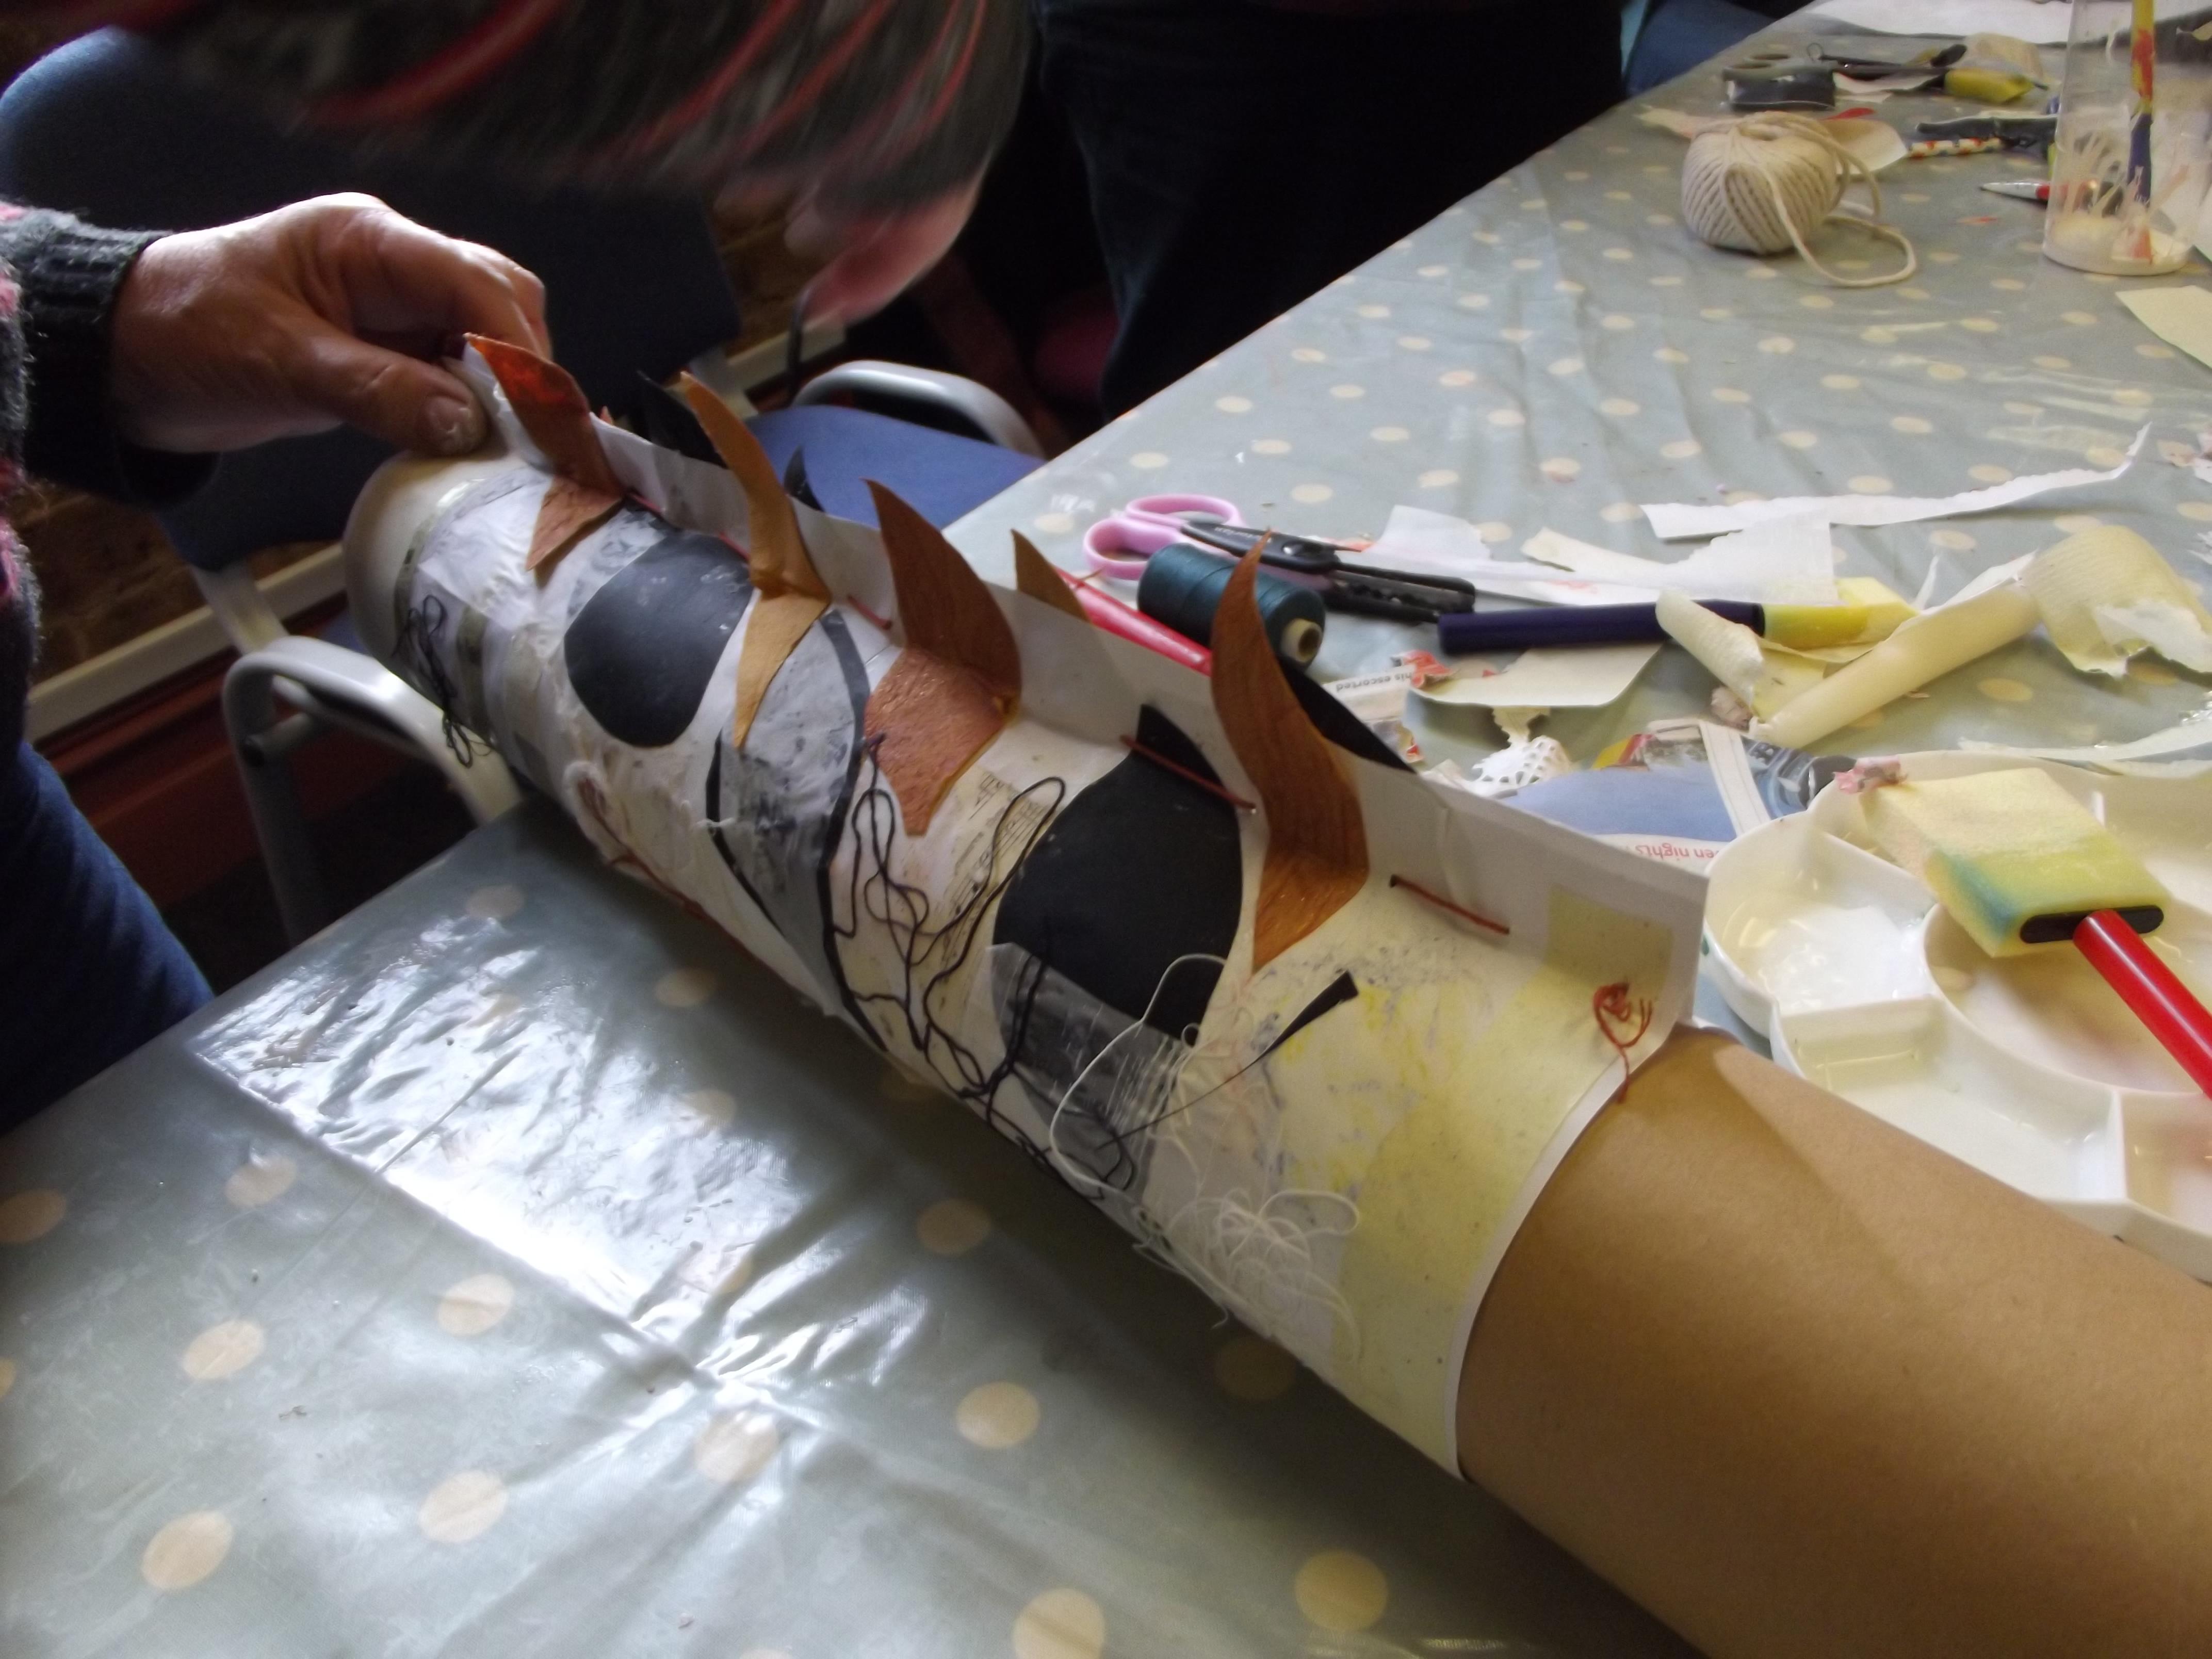 Making a vessel